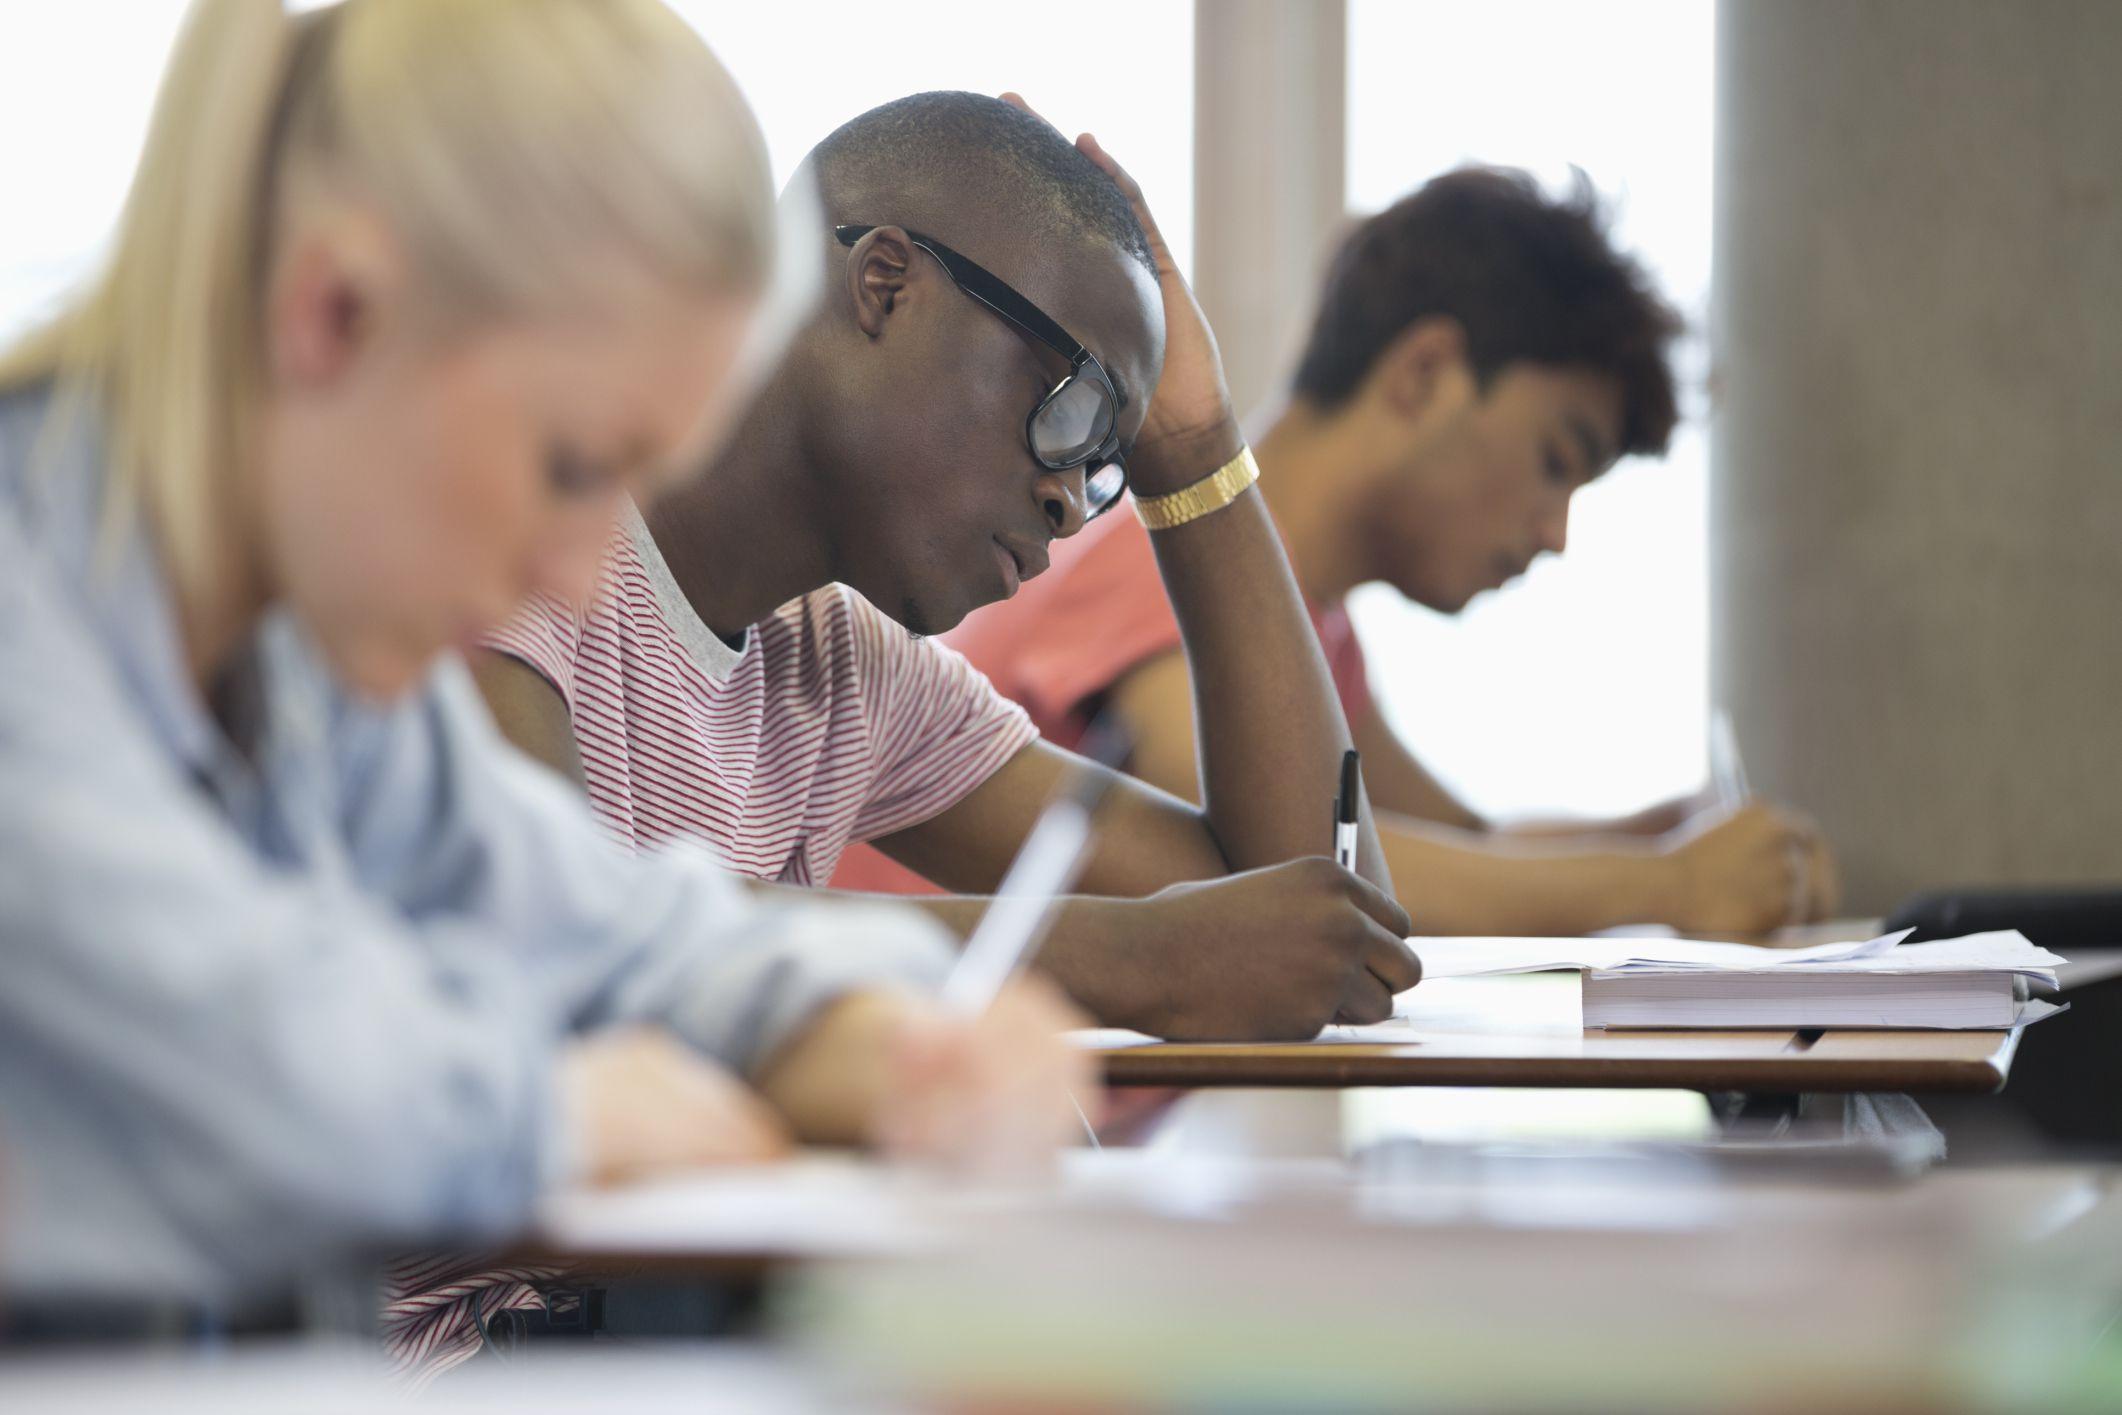 final exam jcva gse english language arts 10 2017 Exam 2017 1 english quotes  final exam jcva-gse-english language arts 10 2017  en 206 unit 3: the english modern period: quotes/notes exam 3 pionke.